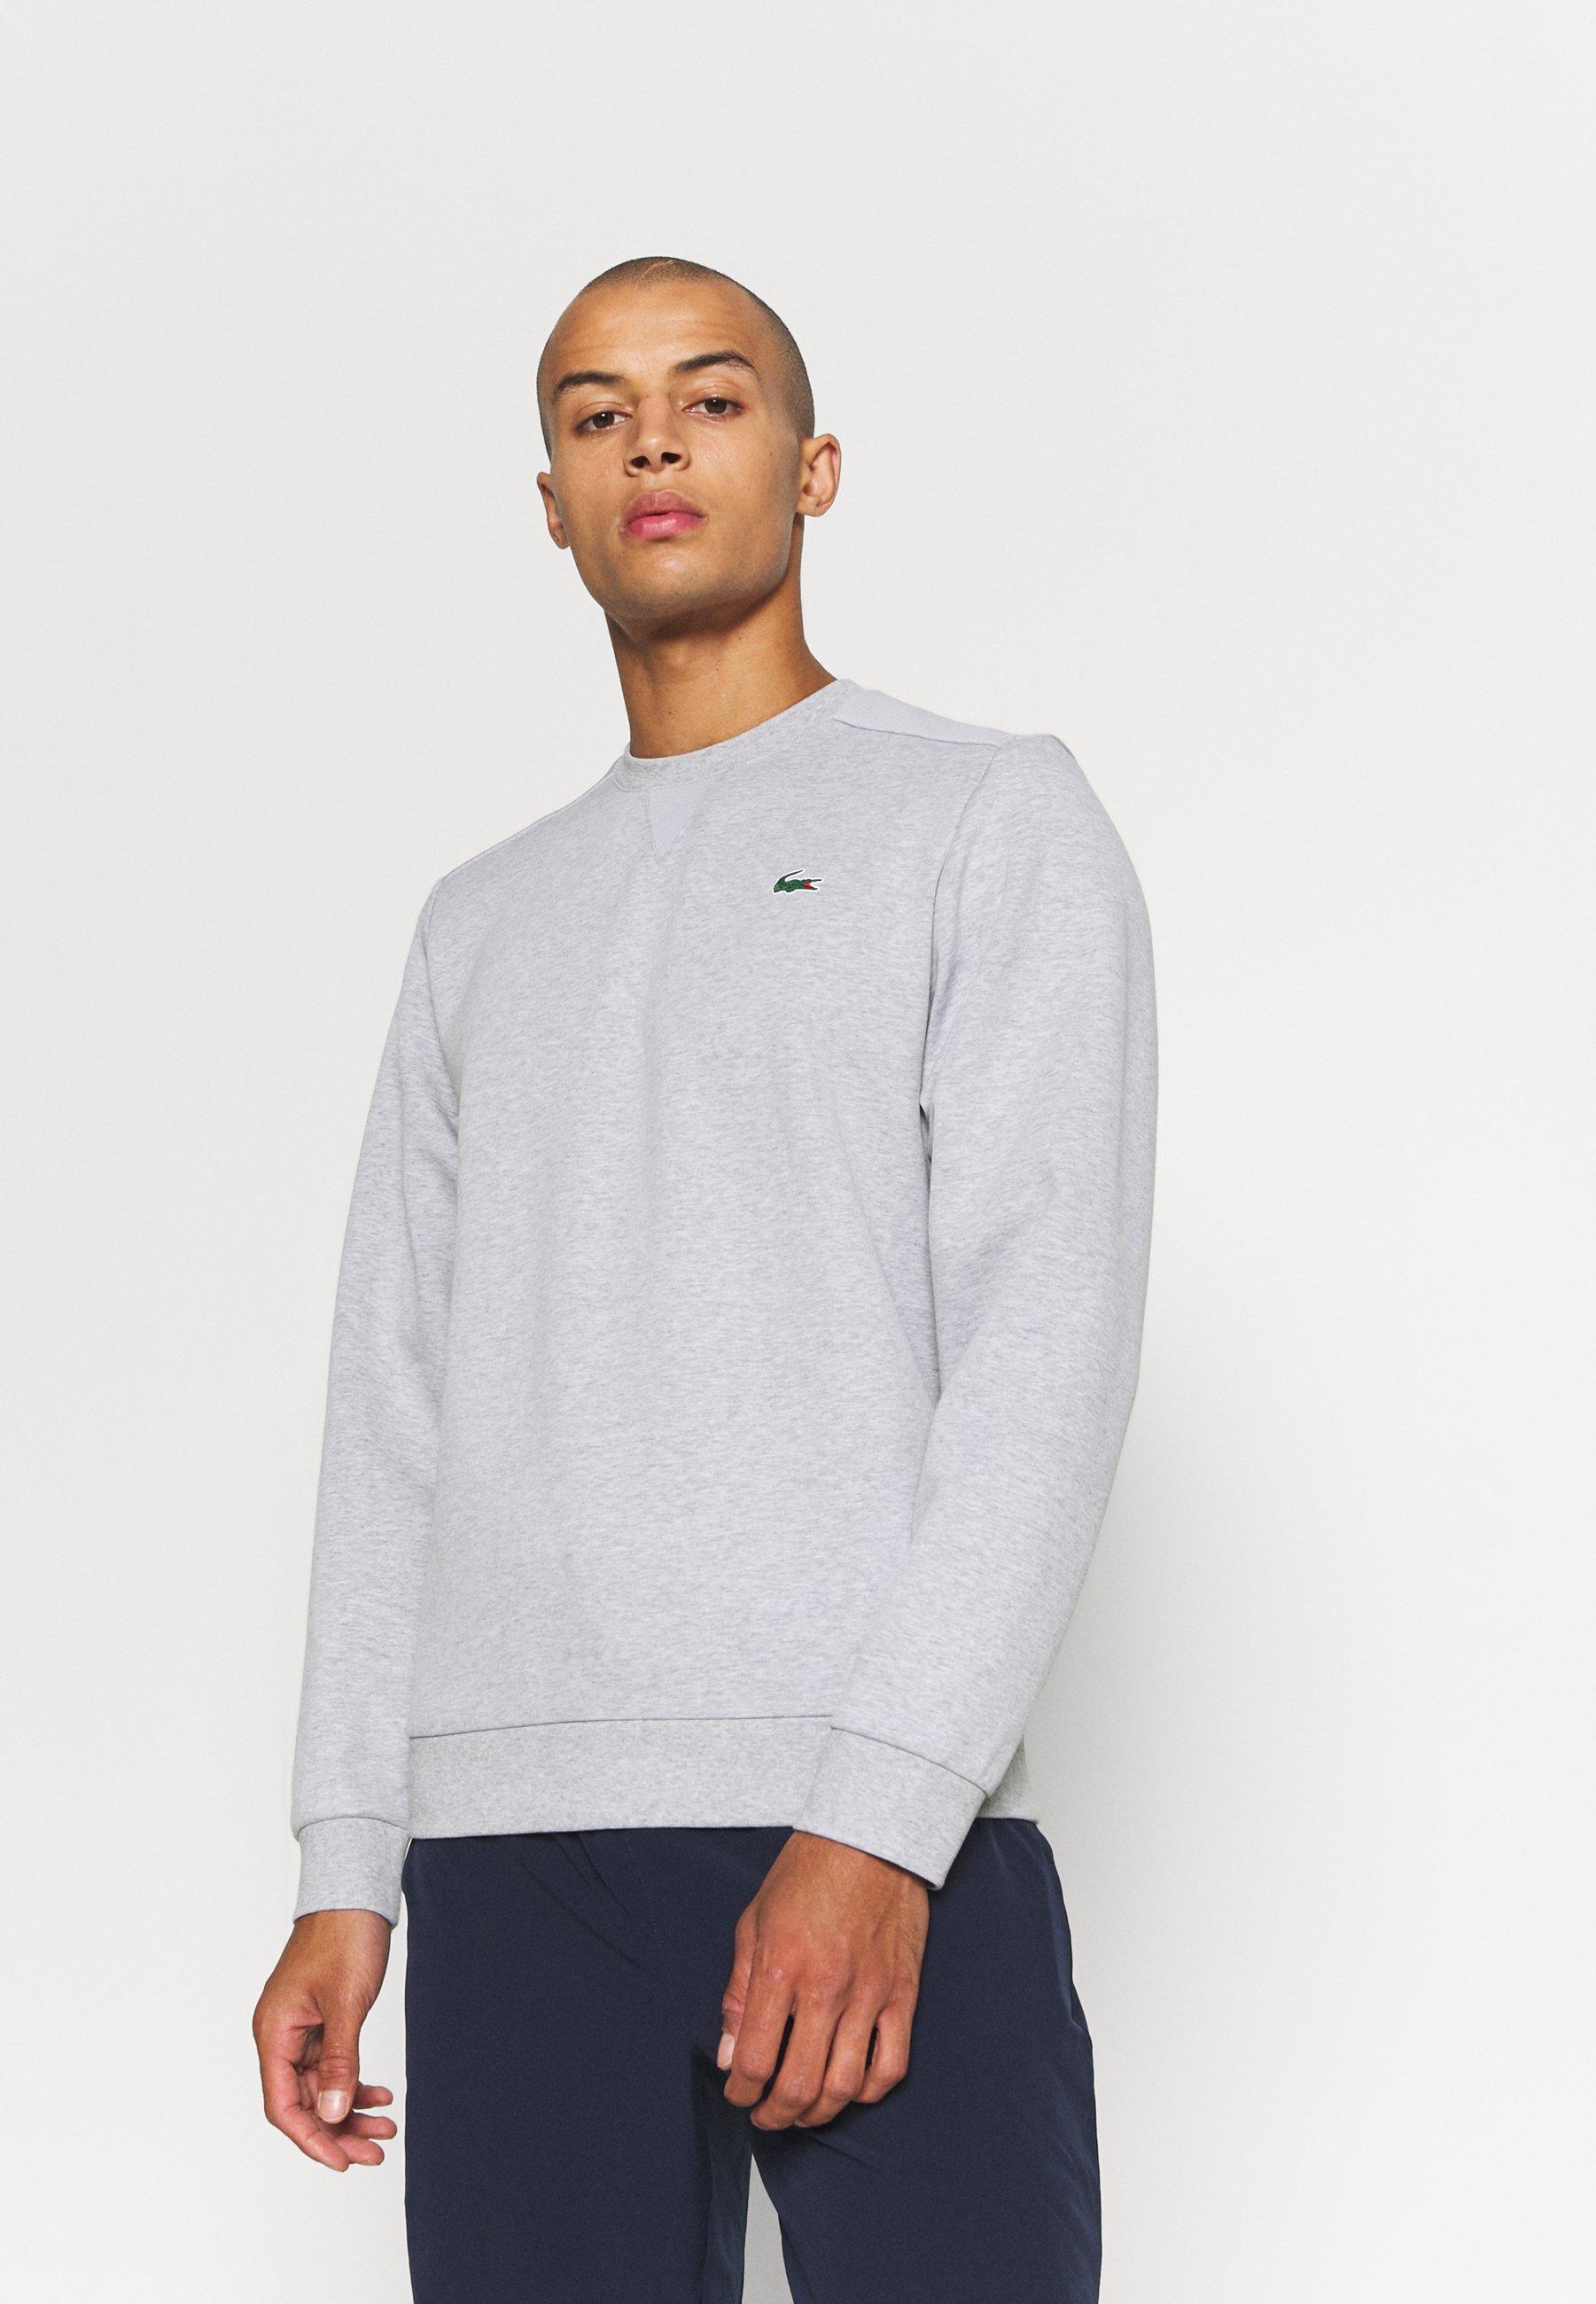 Herrer Sweatshirts